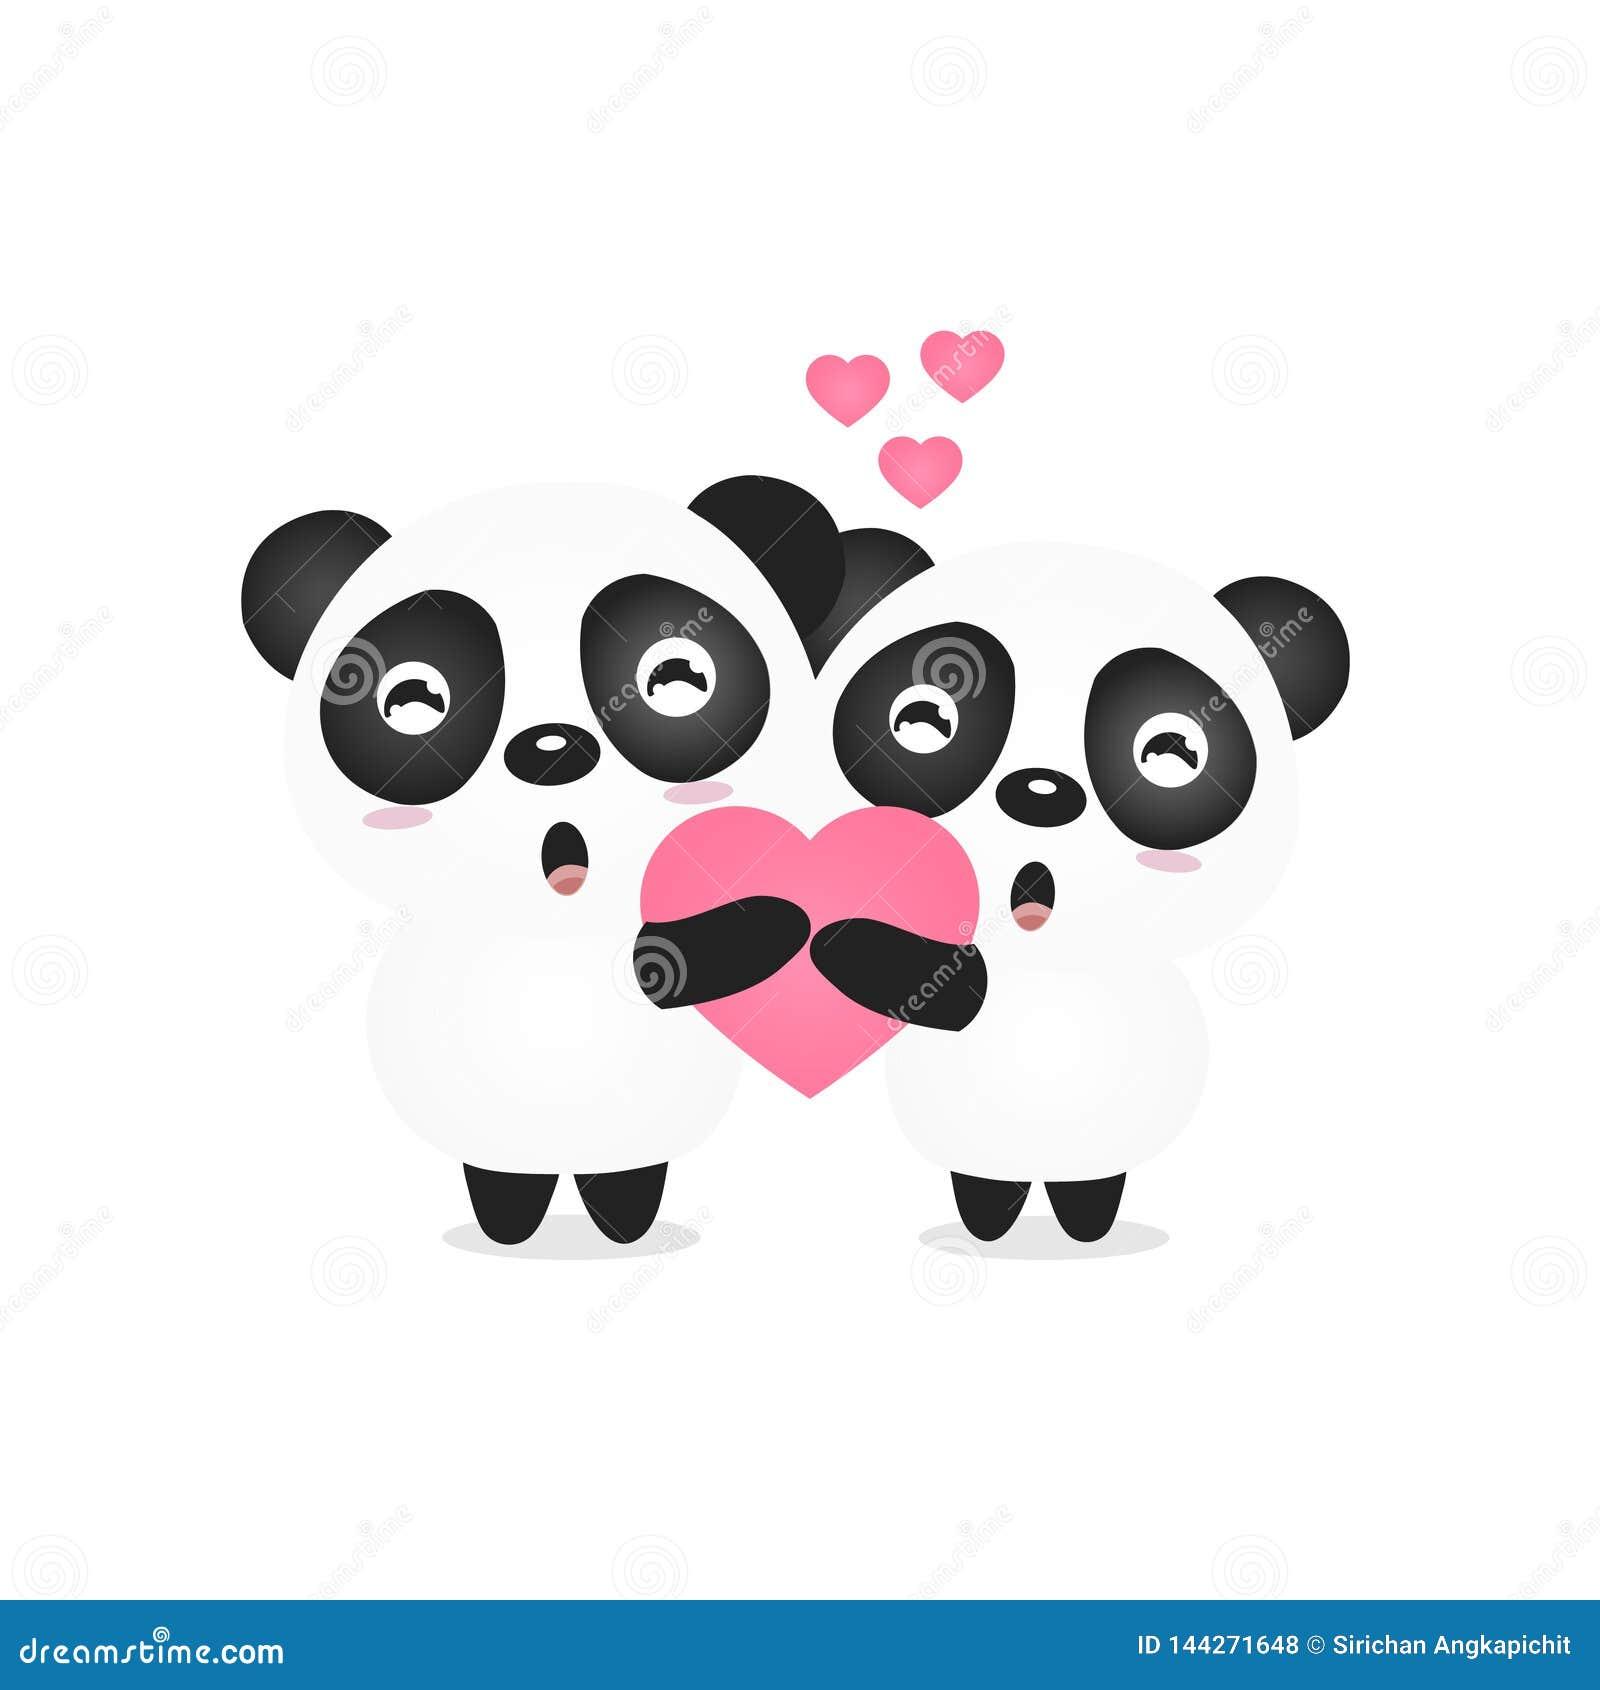 Valentine illustration of a cute couple panda holding heart.